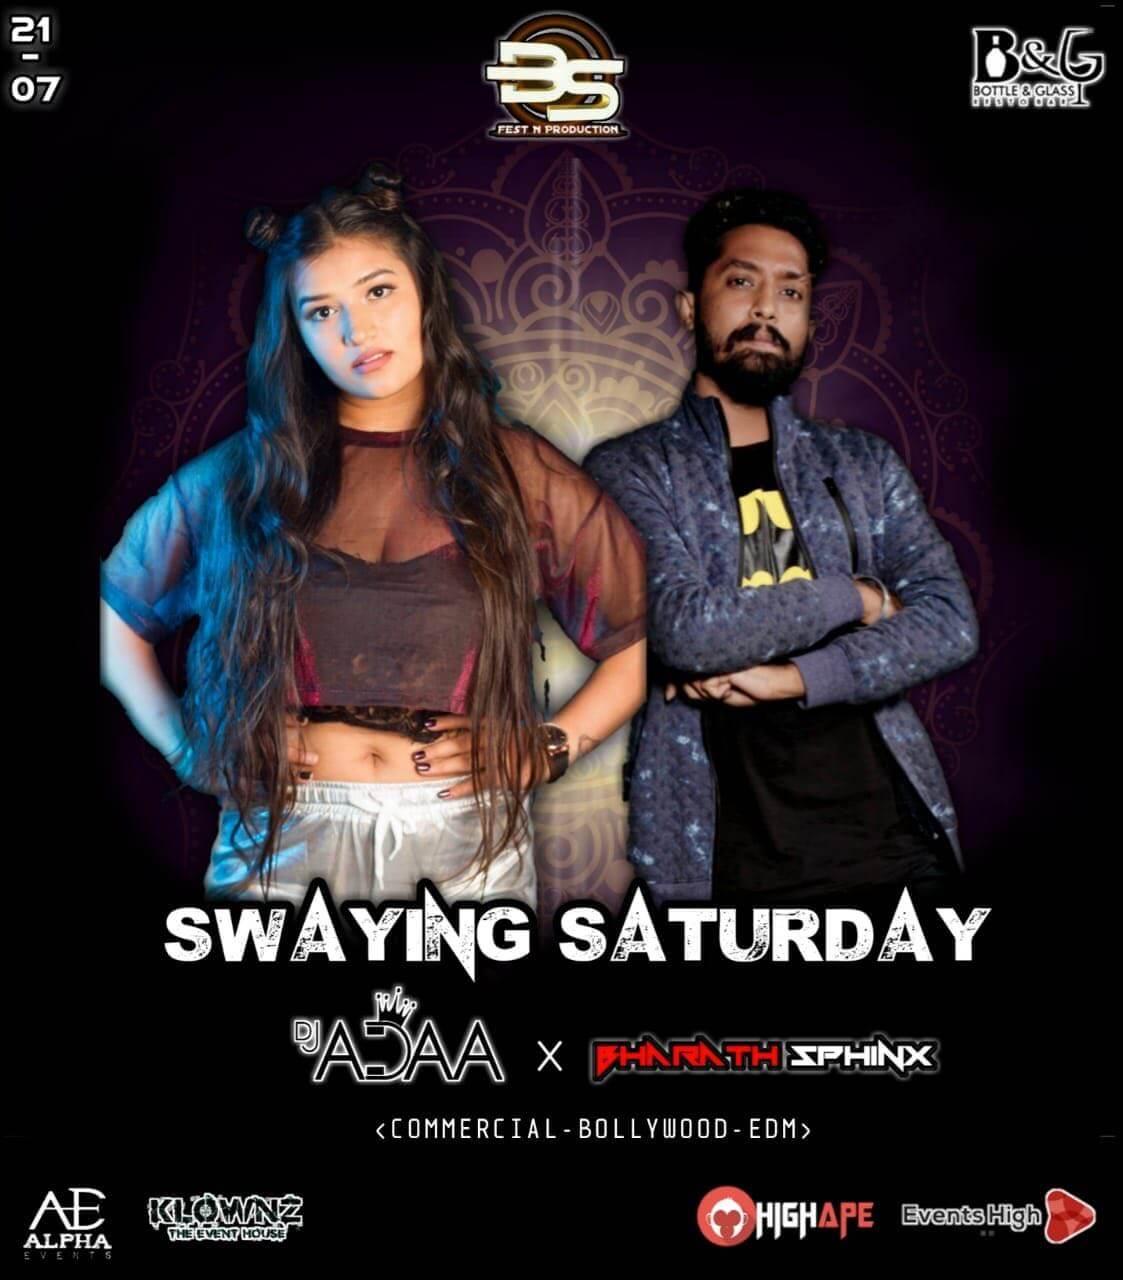 Swaying Saturday